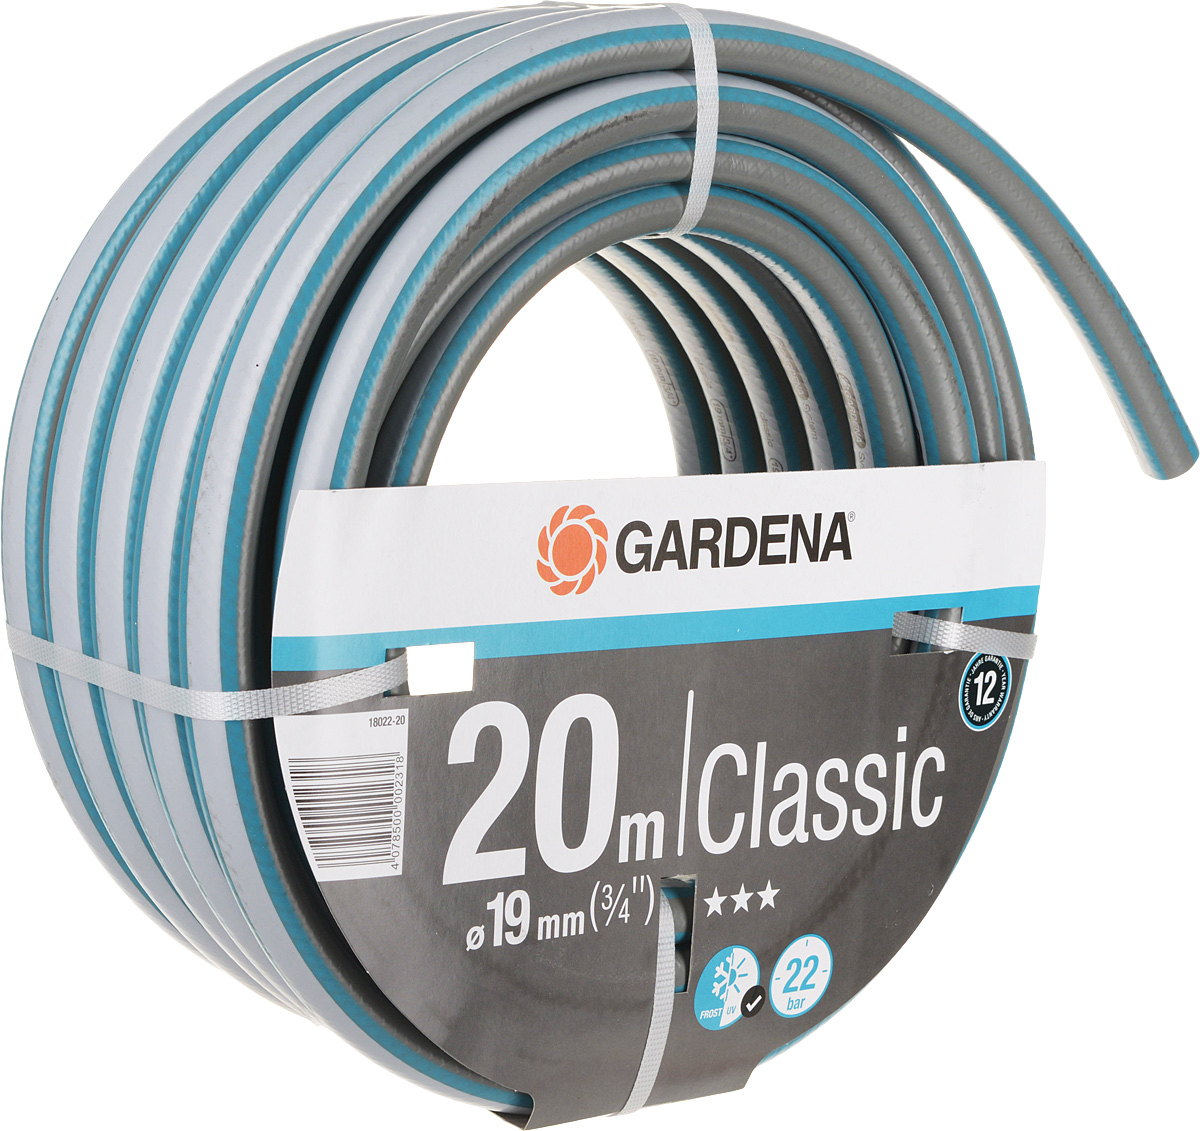 Шланг Gardena Classic, цвет: серый, голубой, 19 мм (3/4) х 20 м слэклайн classic 15 м